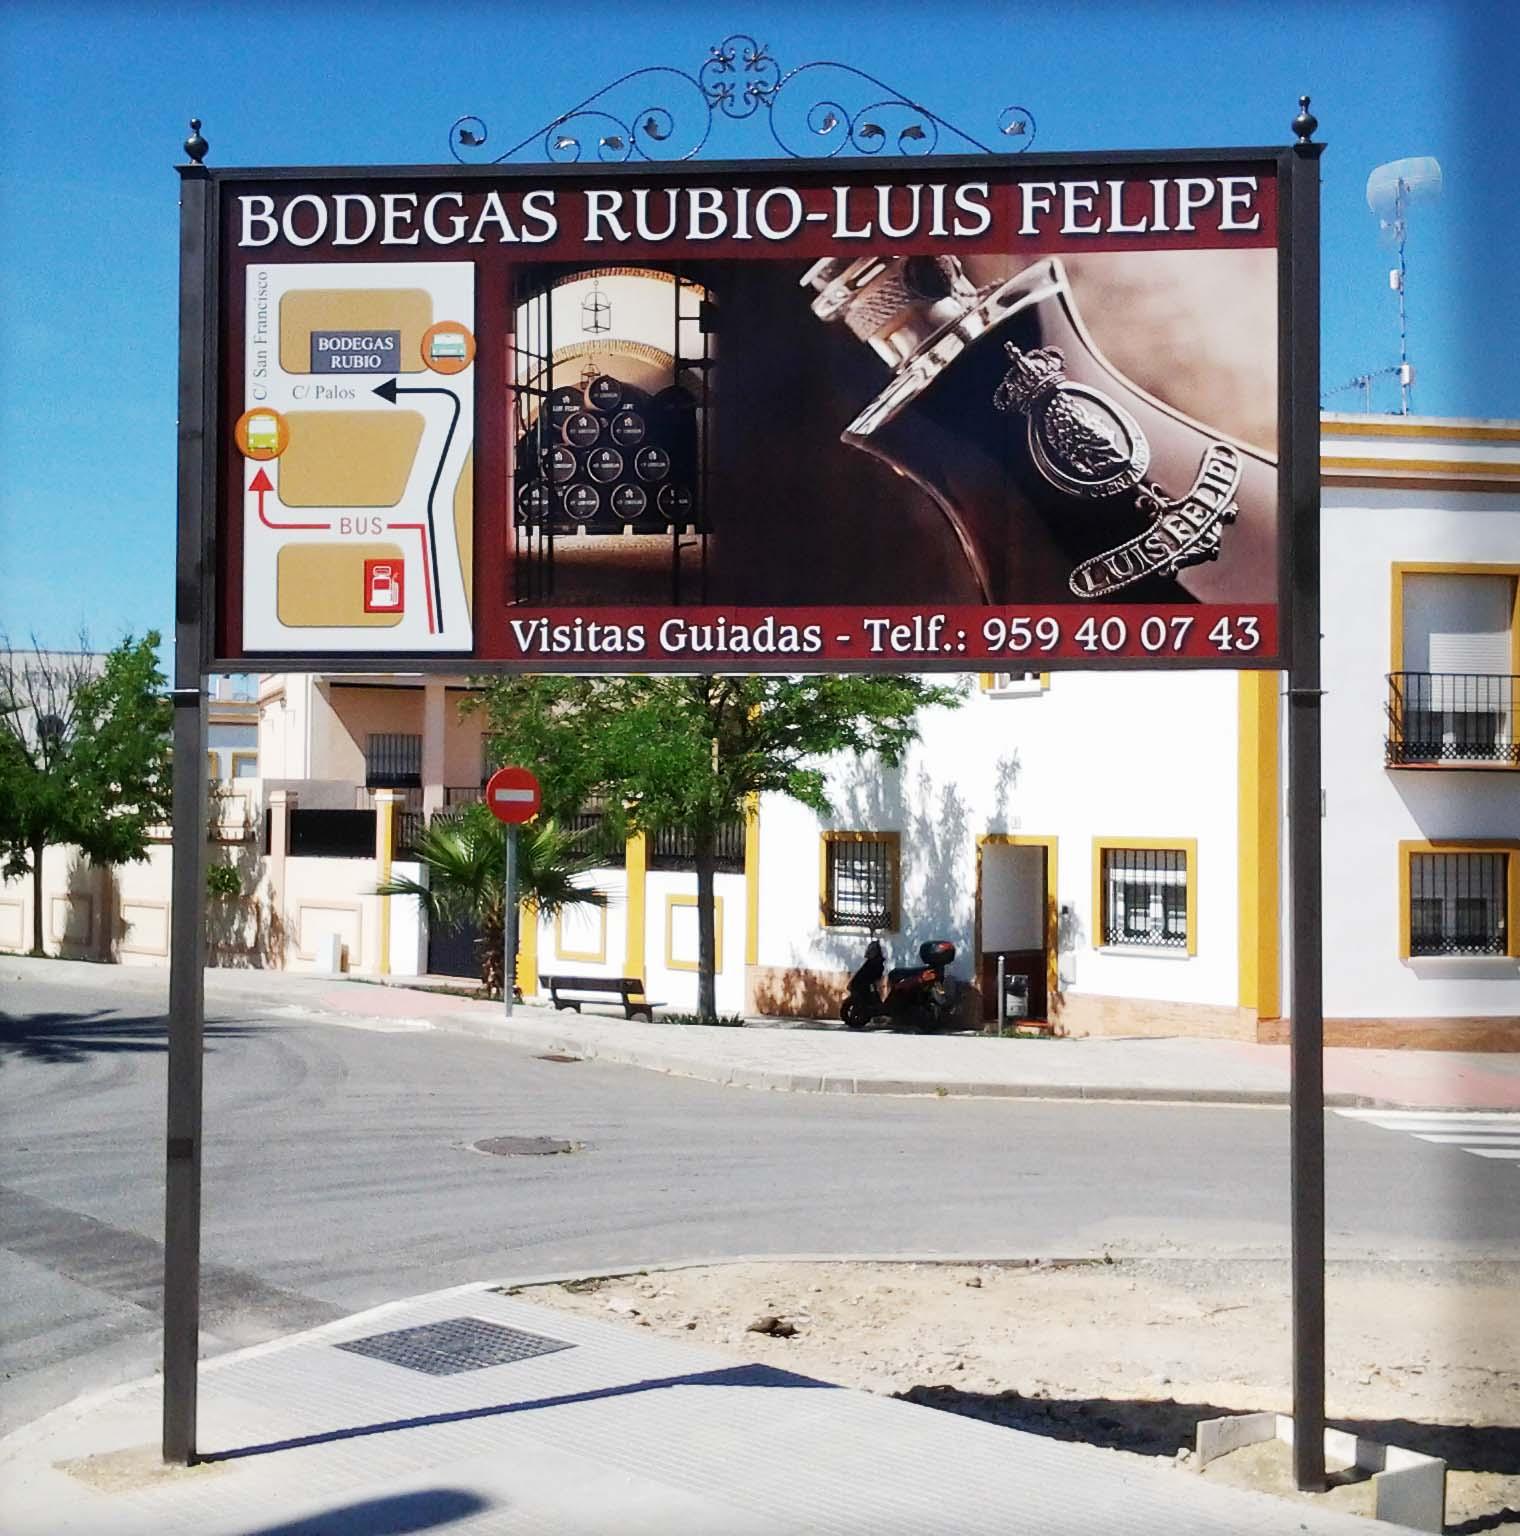 Bodegas Rubio - Luís Felipe